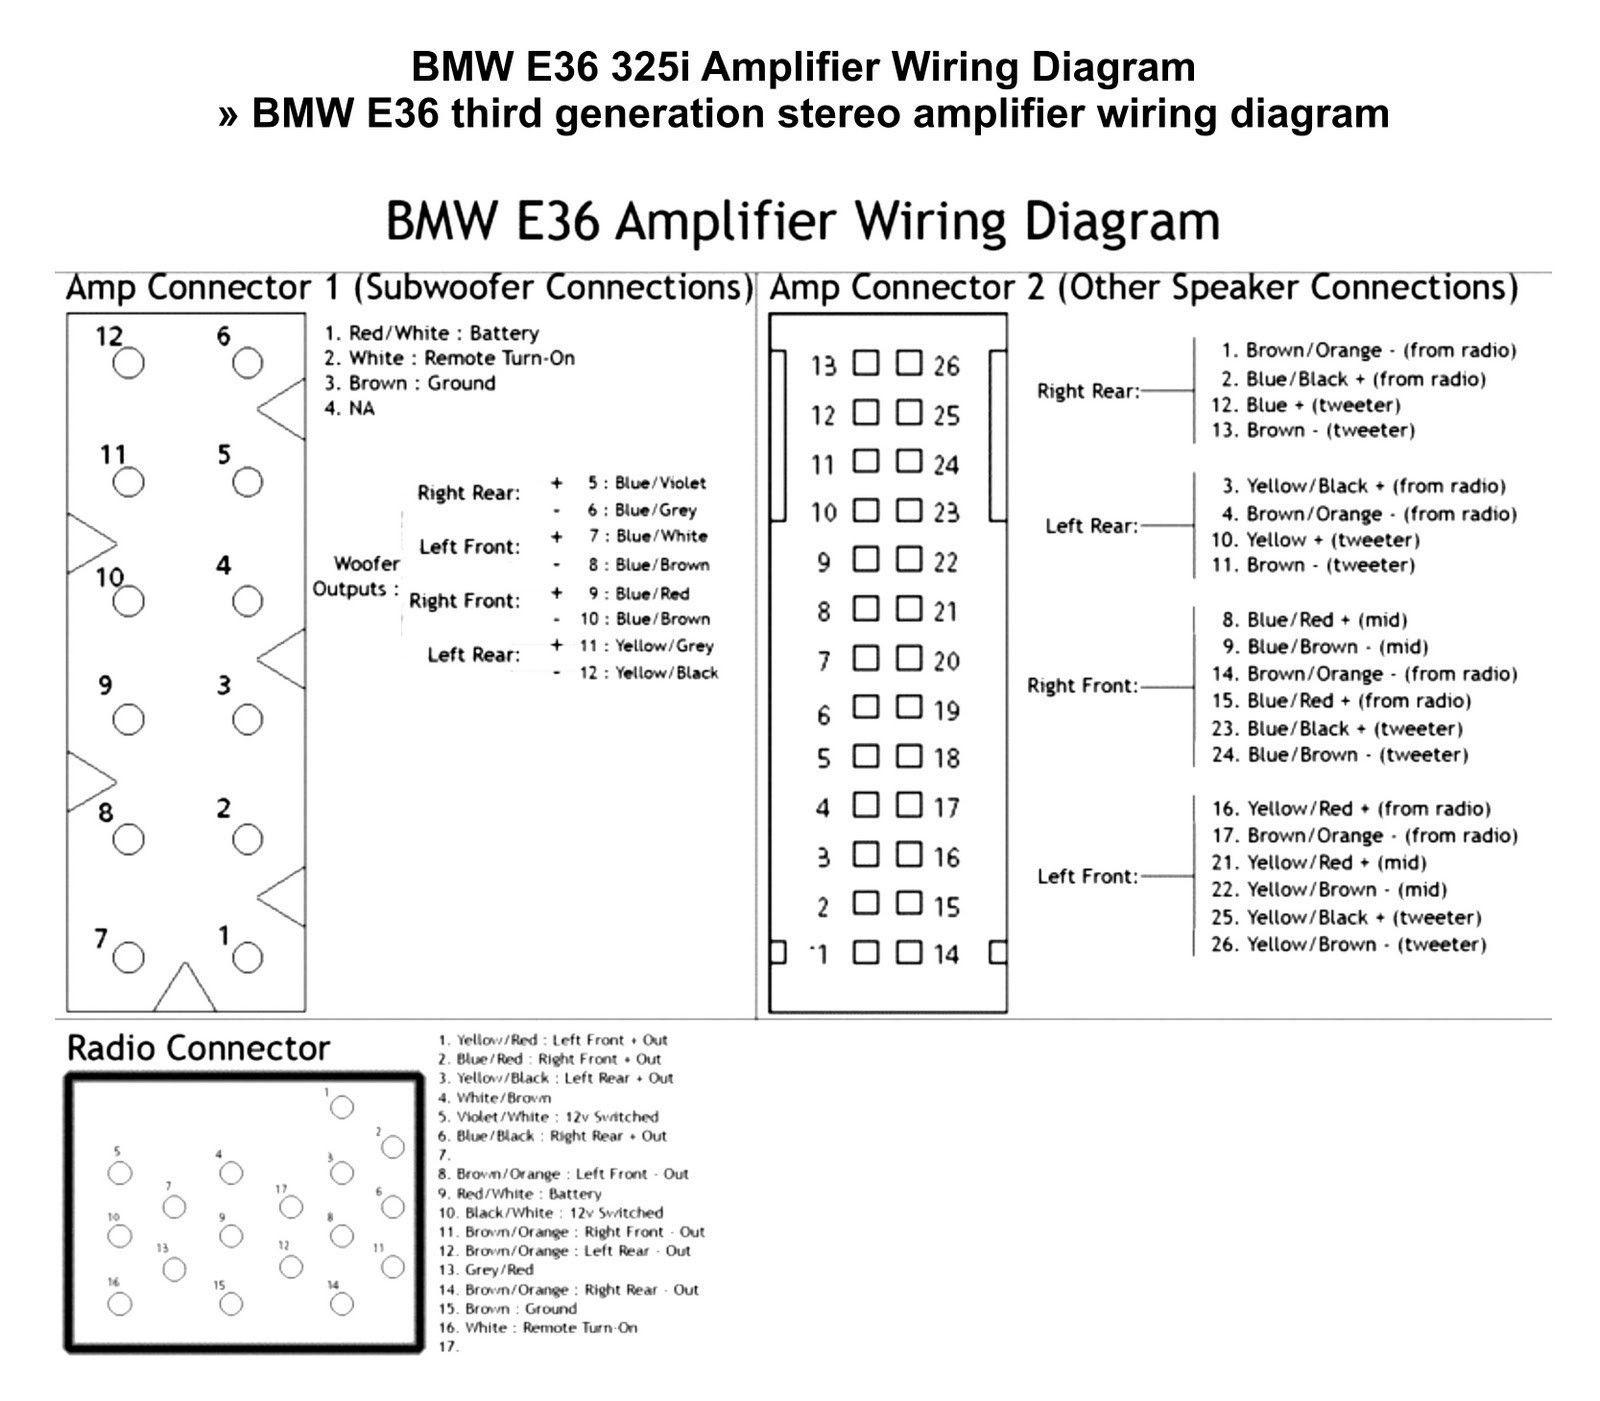 E36 Amplifier Wiring Diagram Diagram Diagramtemplate Diagramsample Bmw Diagram New Bmw